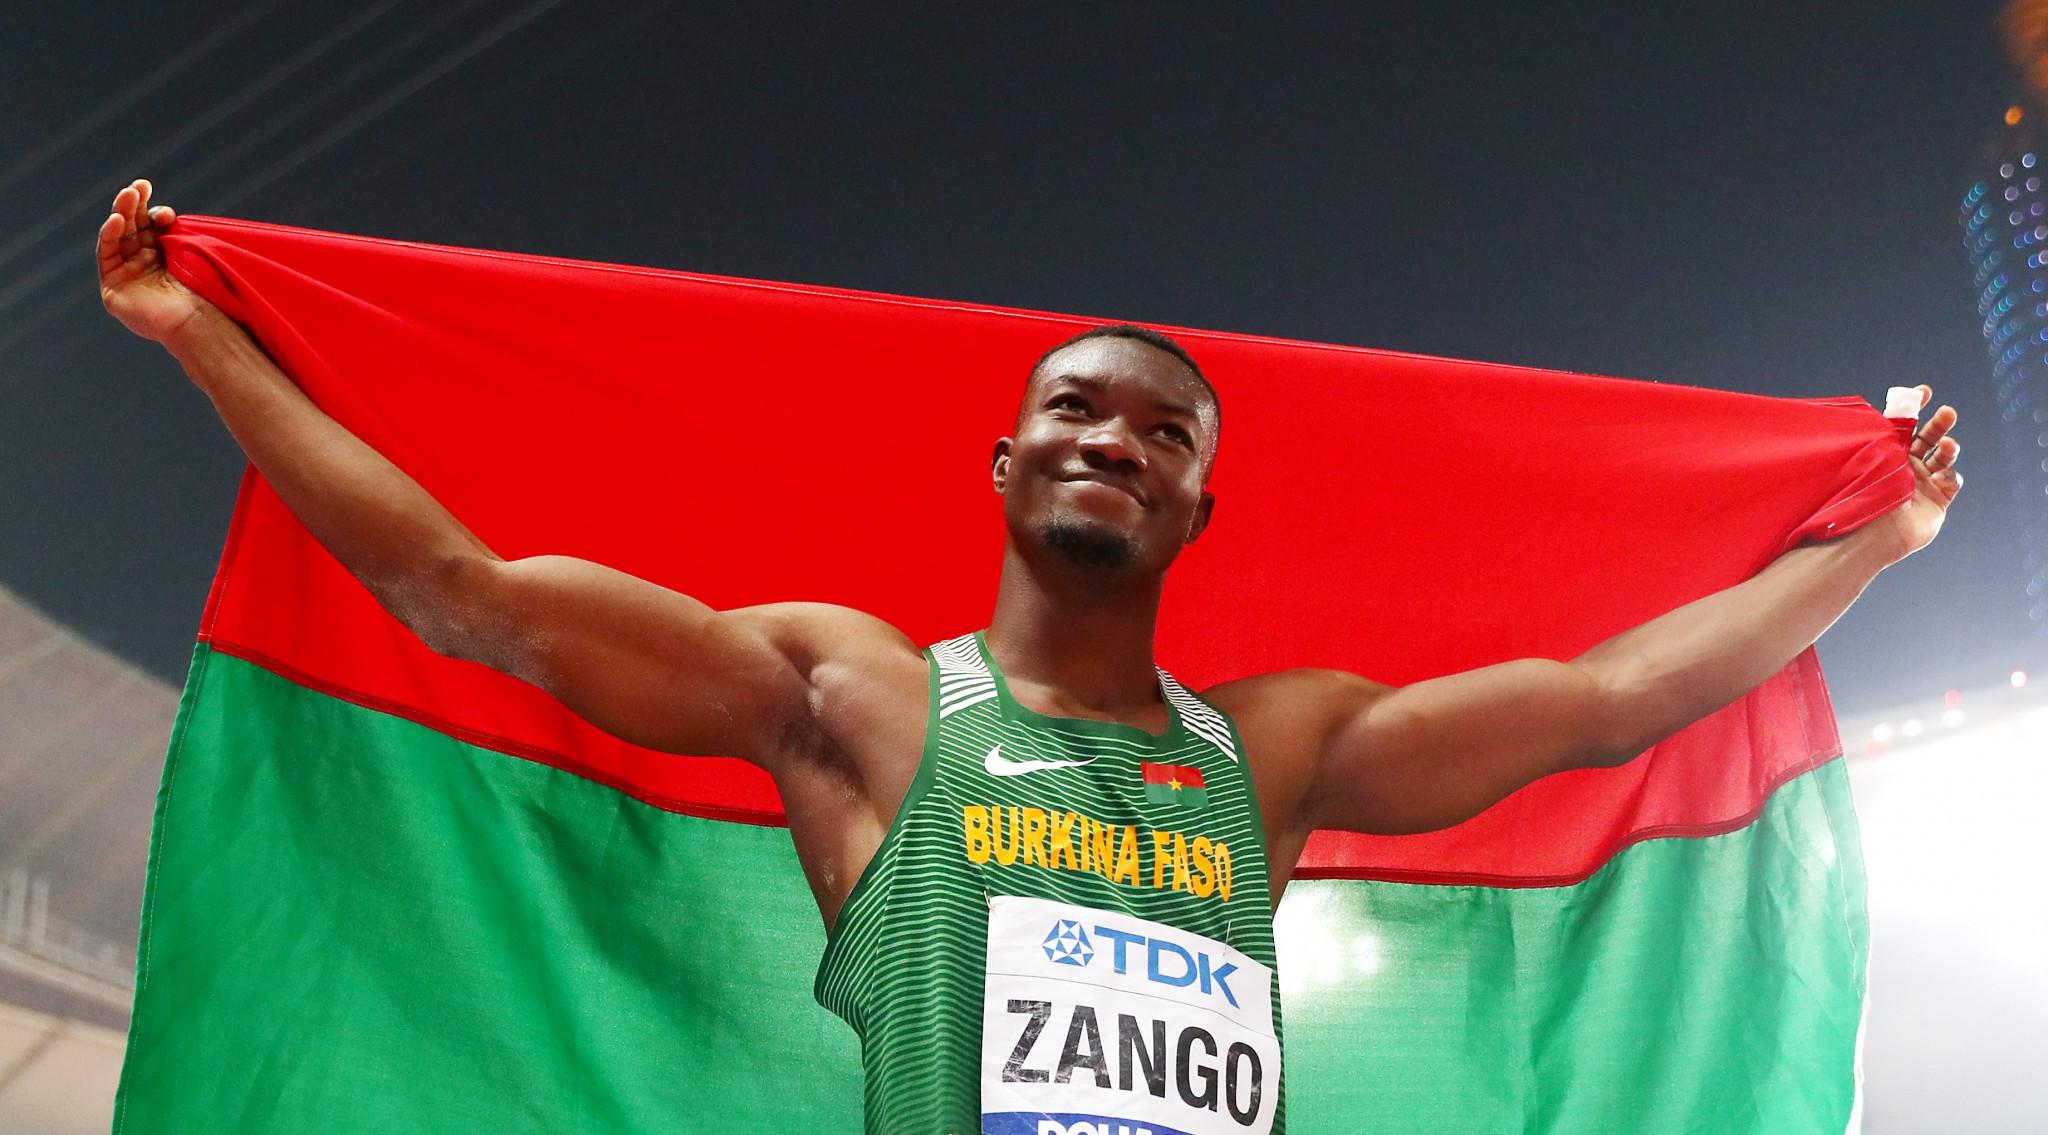 Burkina Faso's Zango set new indoor triple jump world record